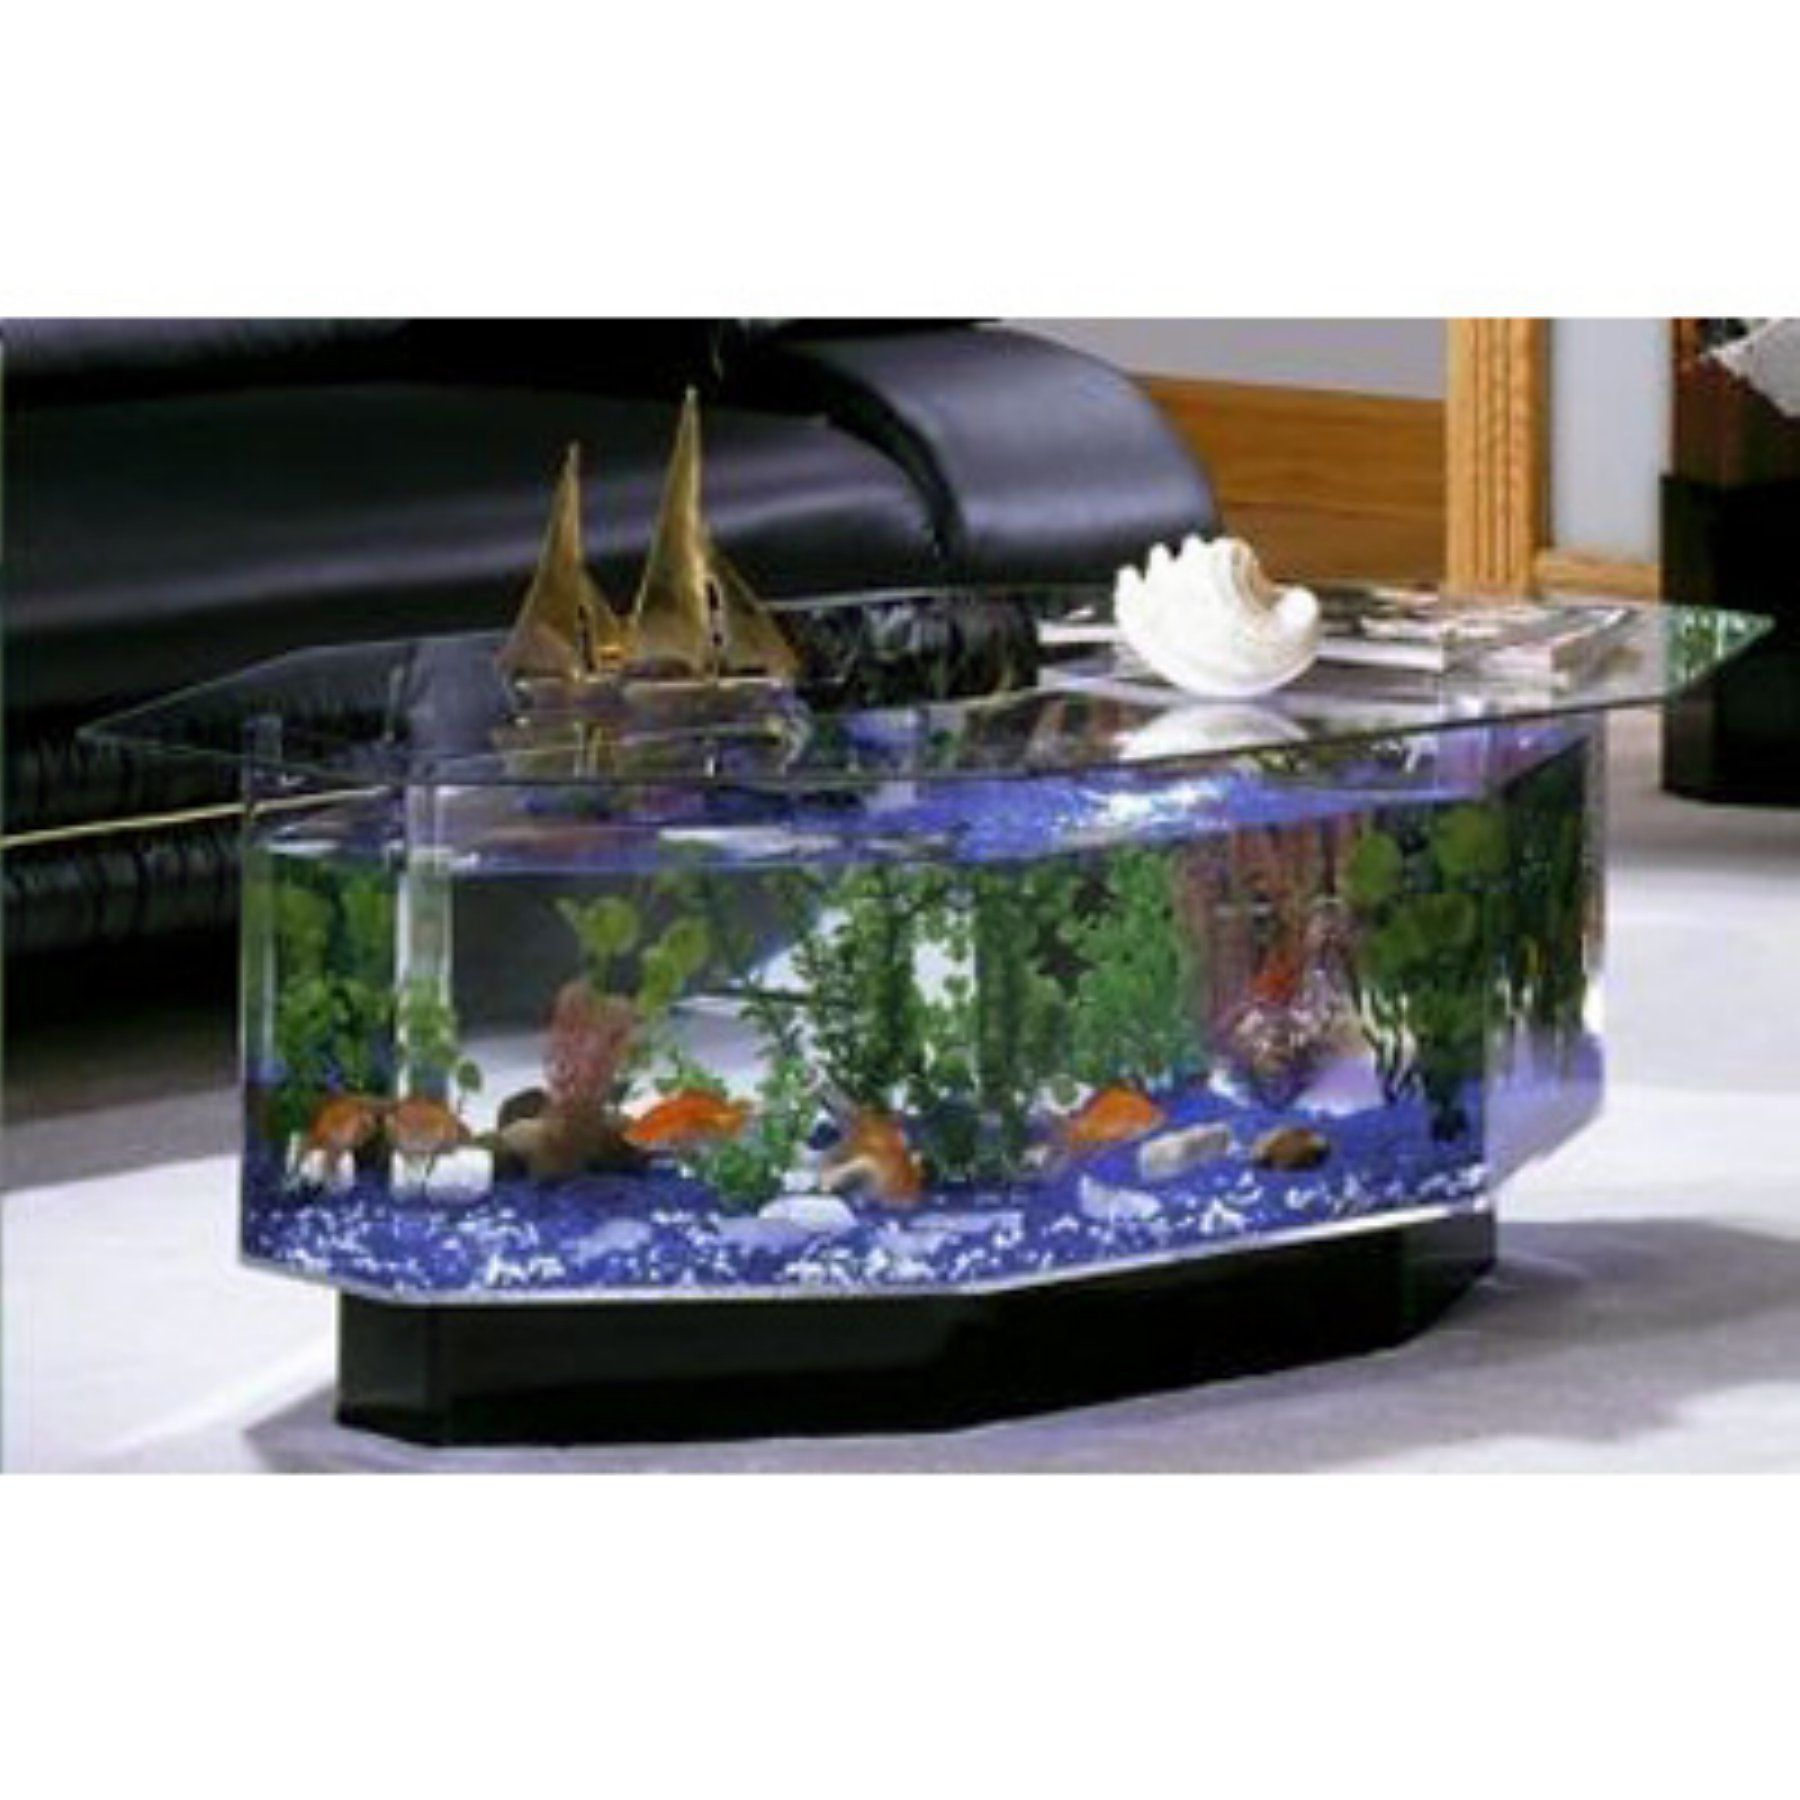 Table Basse Terrarium A Vendre aqua coffee table 28 gallon aquarium - 680   table basse